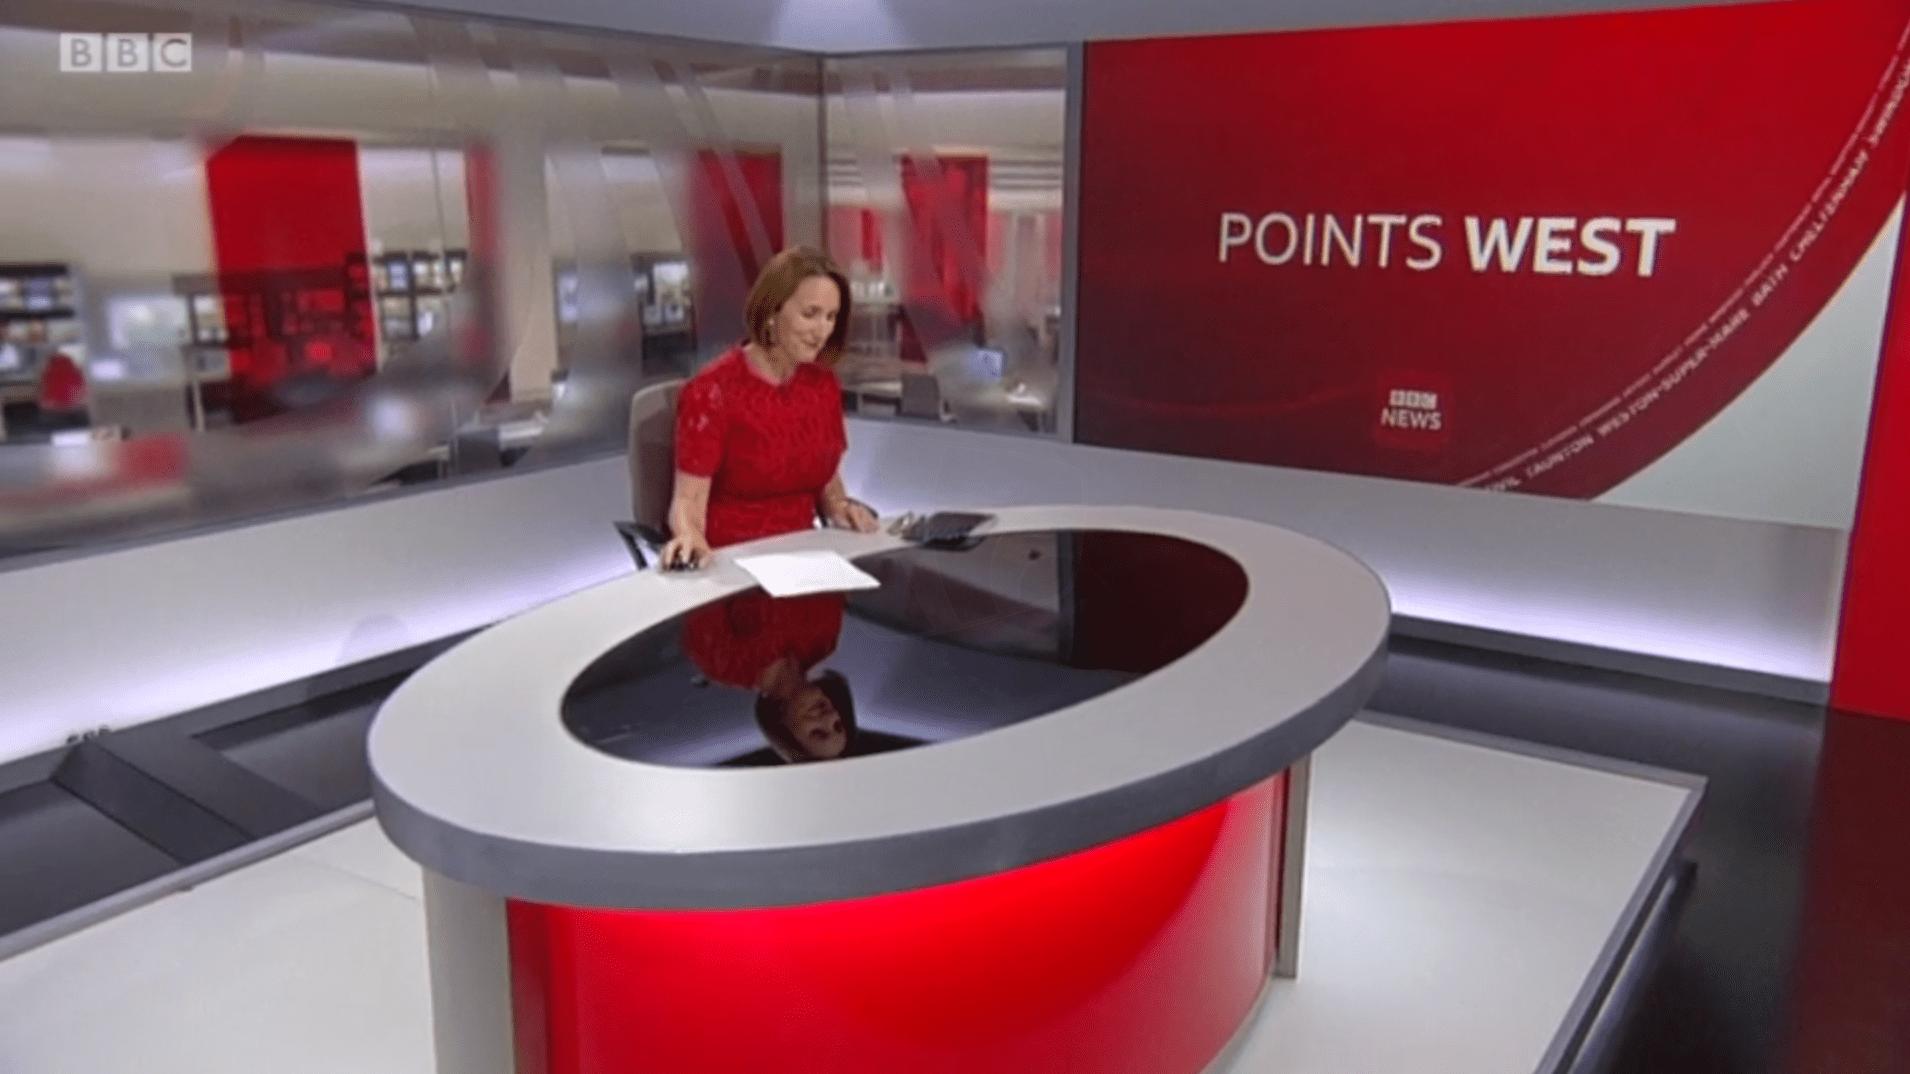 PICTURED: BBC Points West studio presentation. Presenter: Sarah-Jane Bungay.